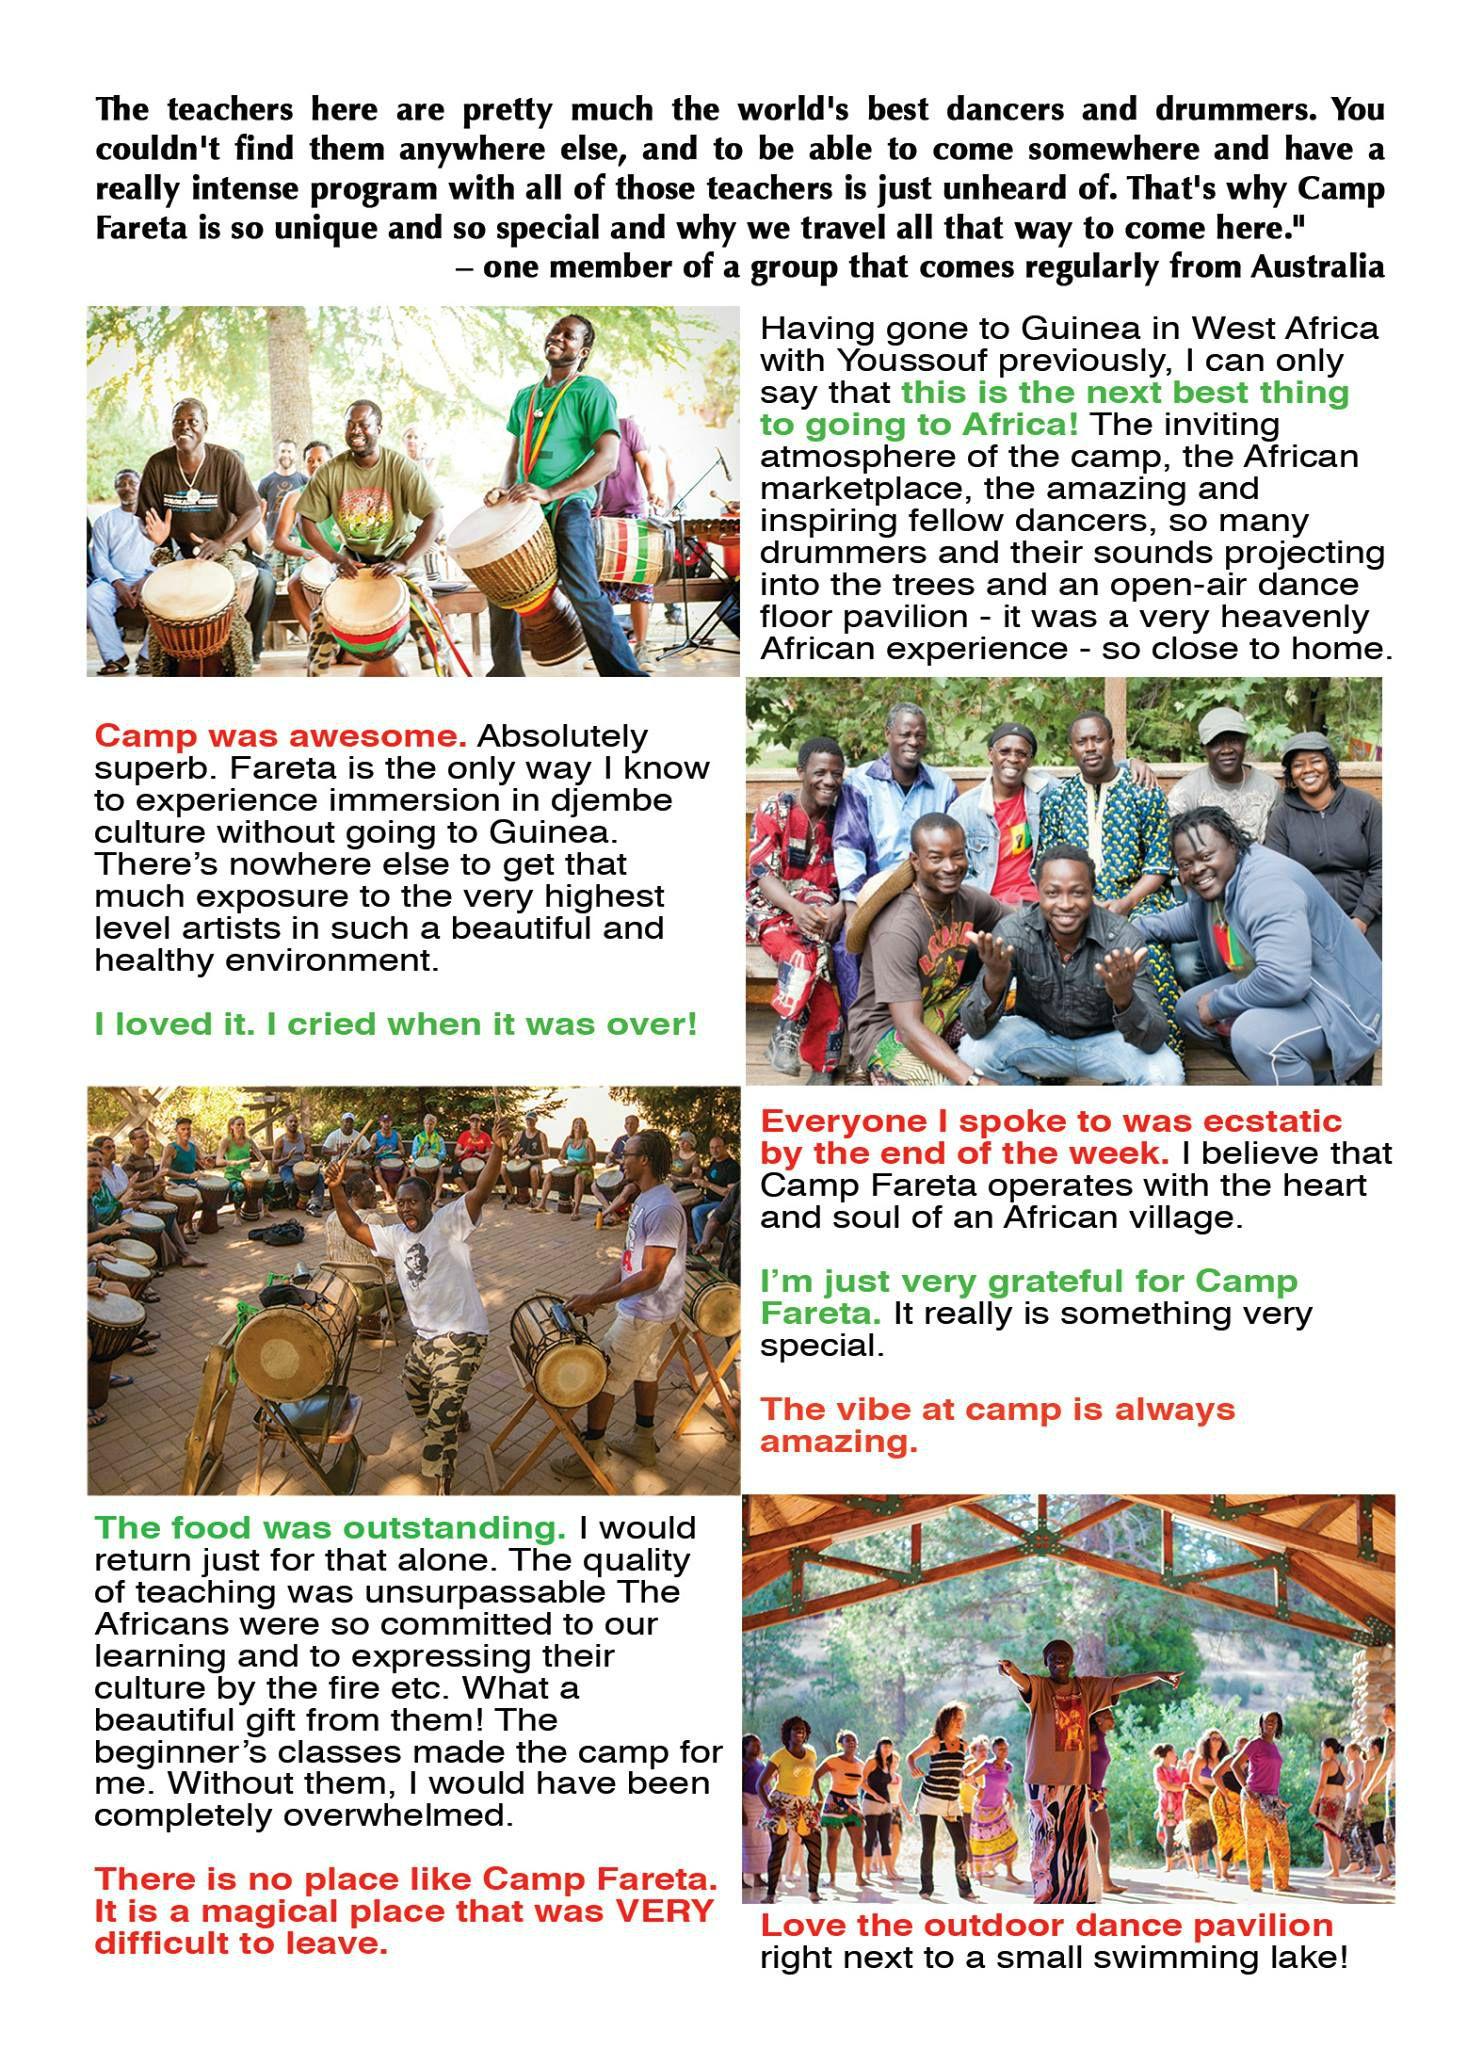 Camp Fareta 2017 info